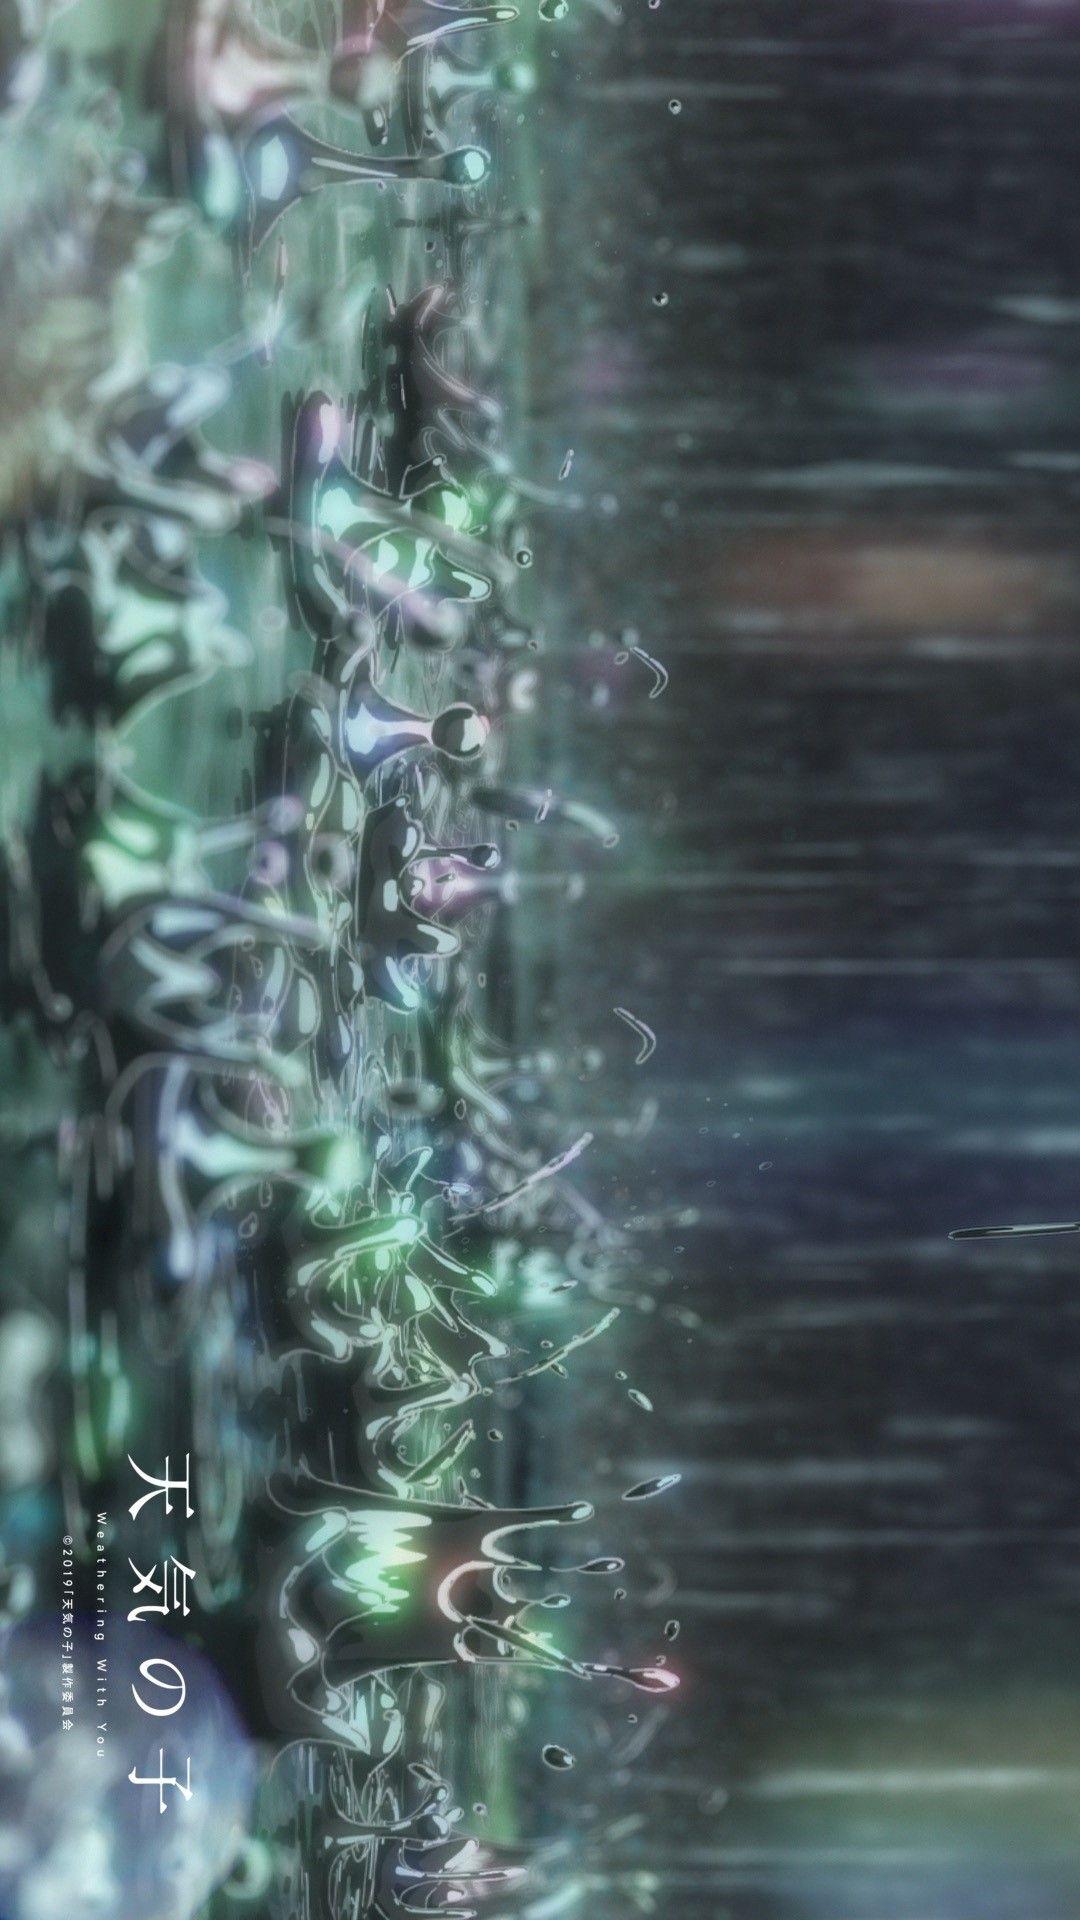 Extraordinarily Beautiful Animation おしゃれまとめの人気アイデア Pinterest Cristian El Sabio アニメの風景 水中 イラスト Iphone 壁紙 アニメ